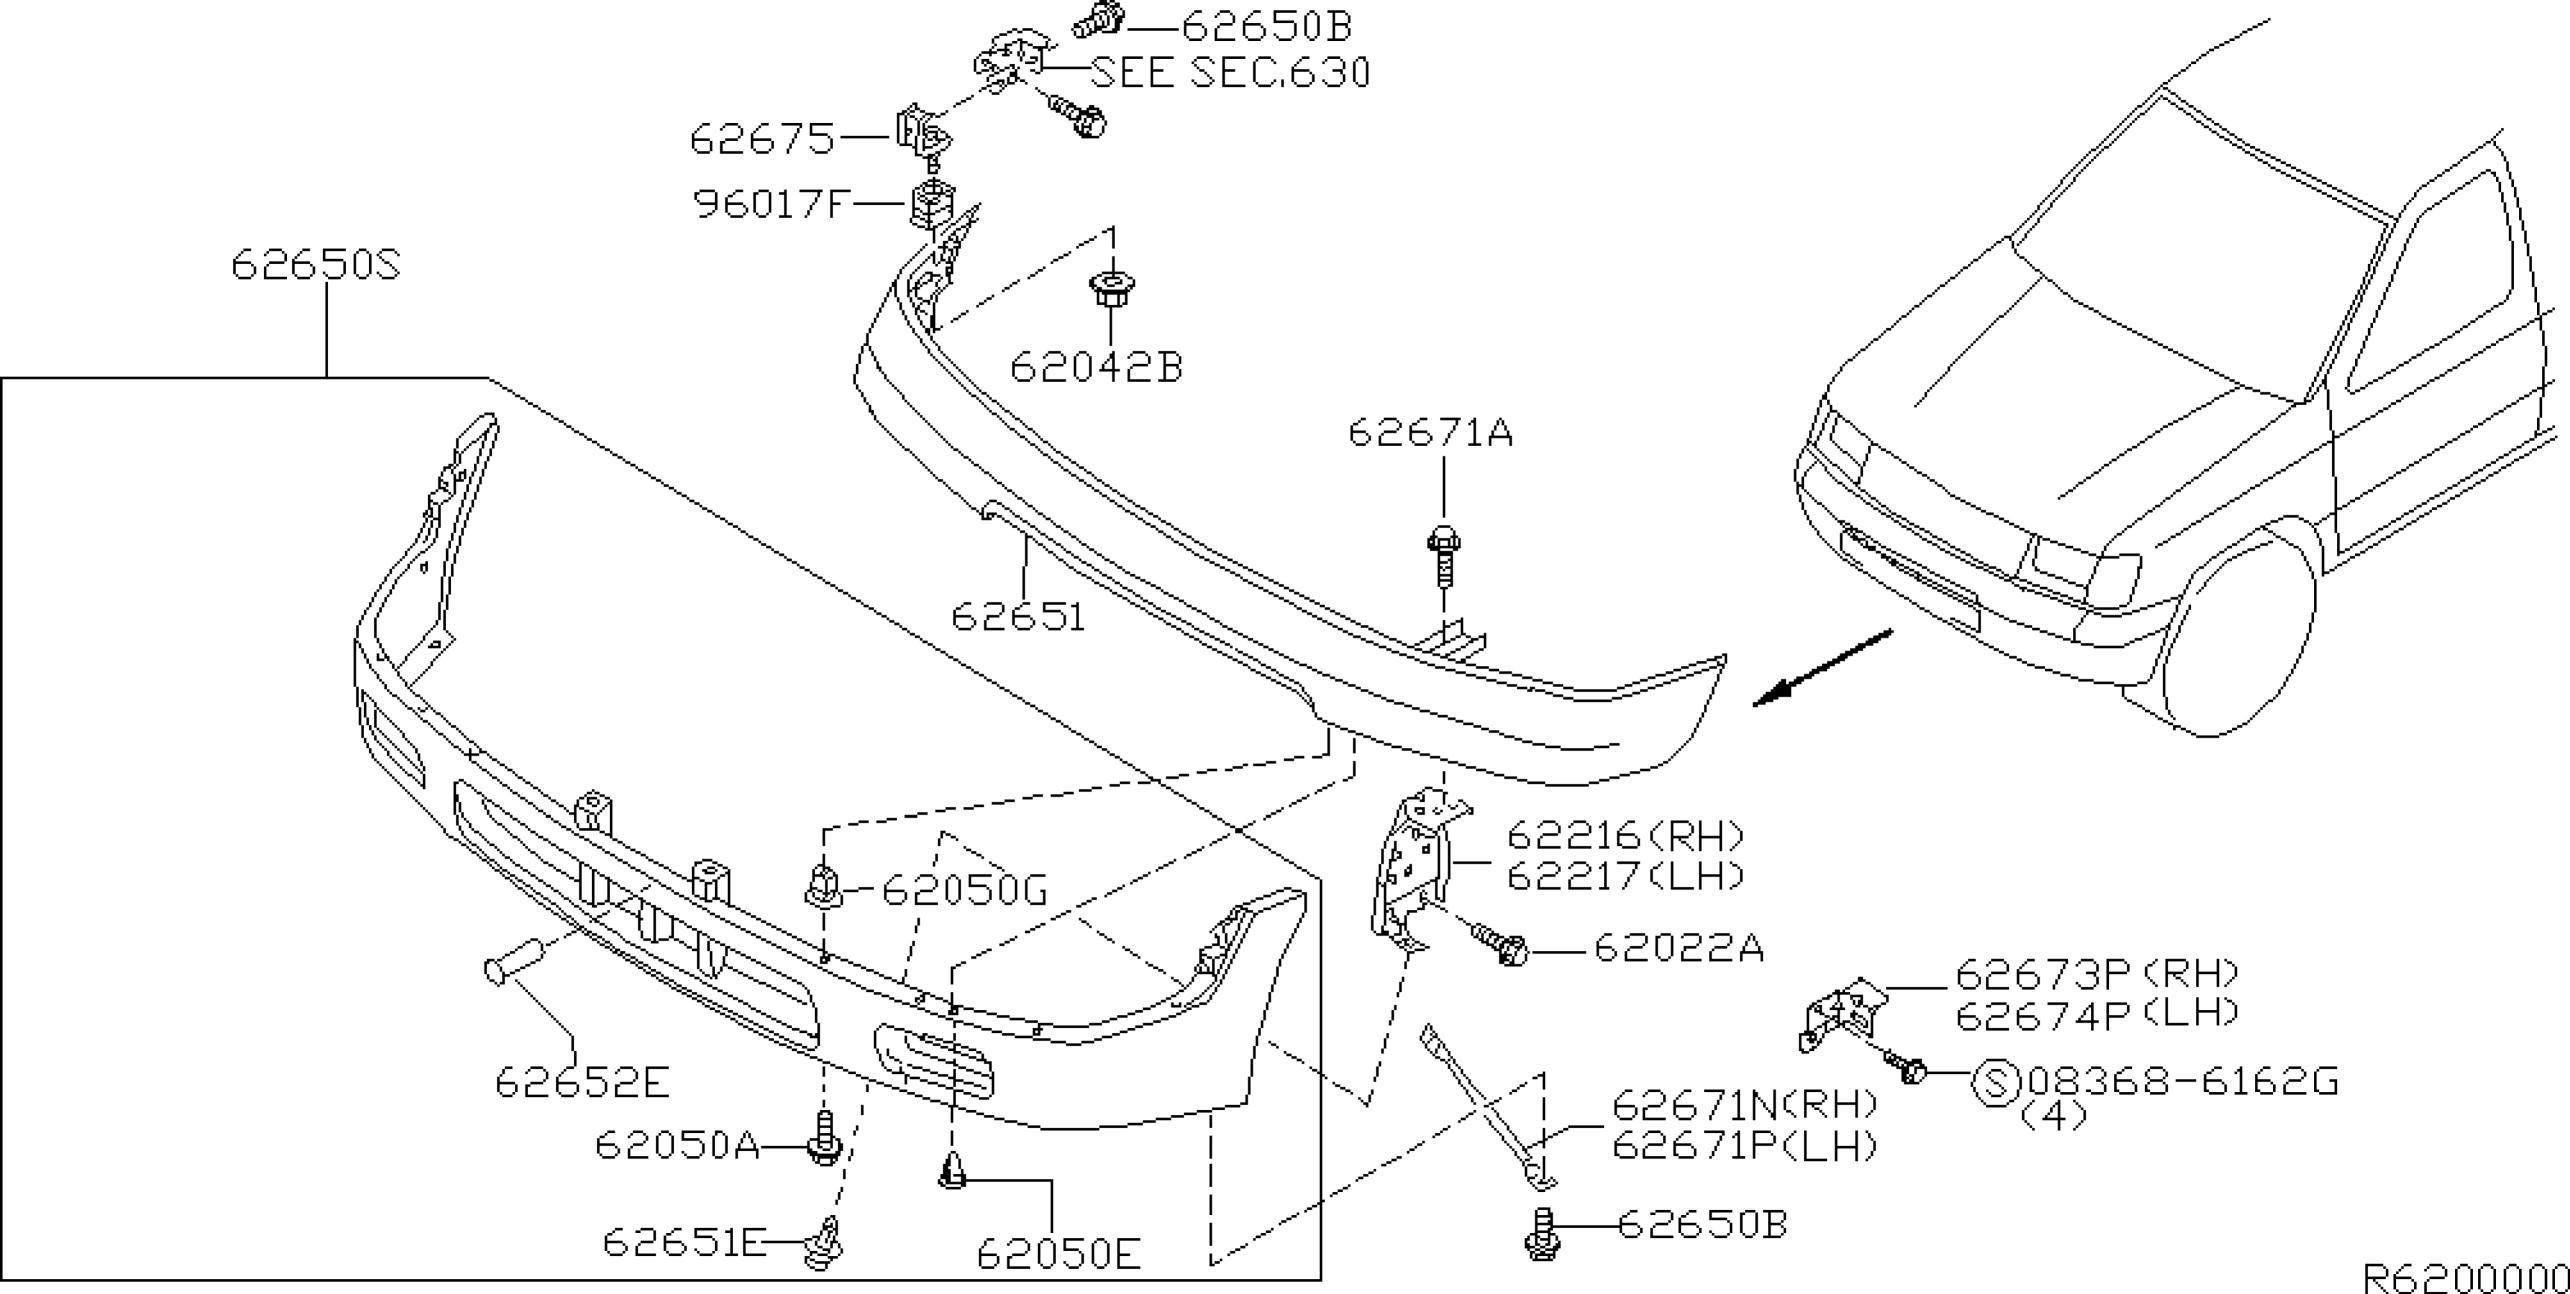 2001 Nissan Xterra Engine Diagram Diagram 2001 Nissan Xterra Engine Diagram Of 2001 Nissan Xterra Engine Diagram